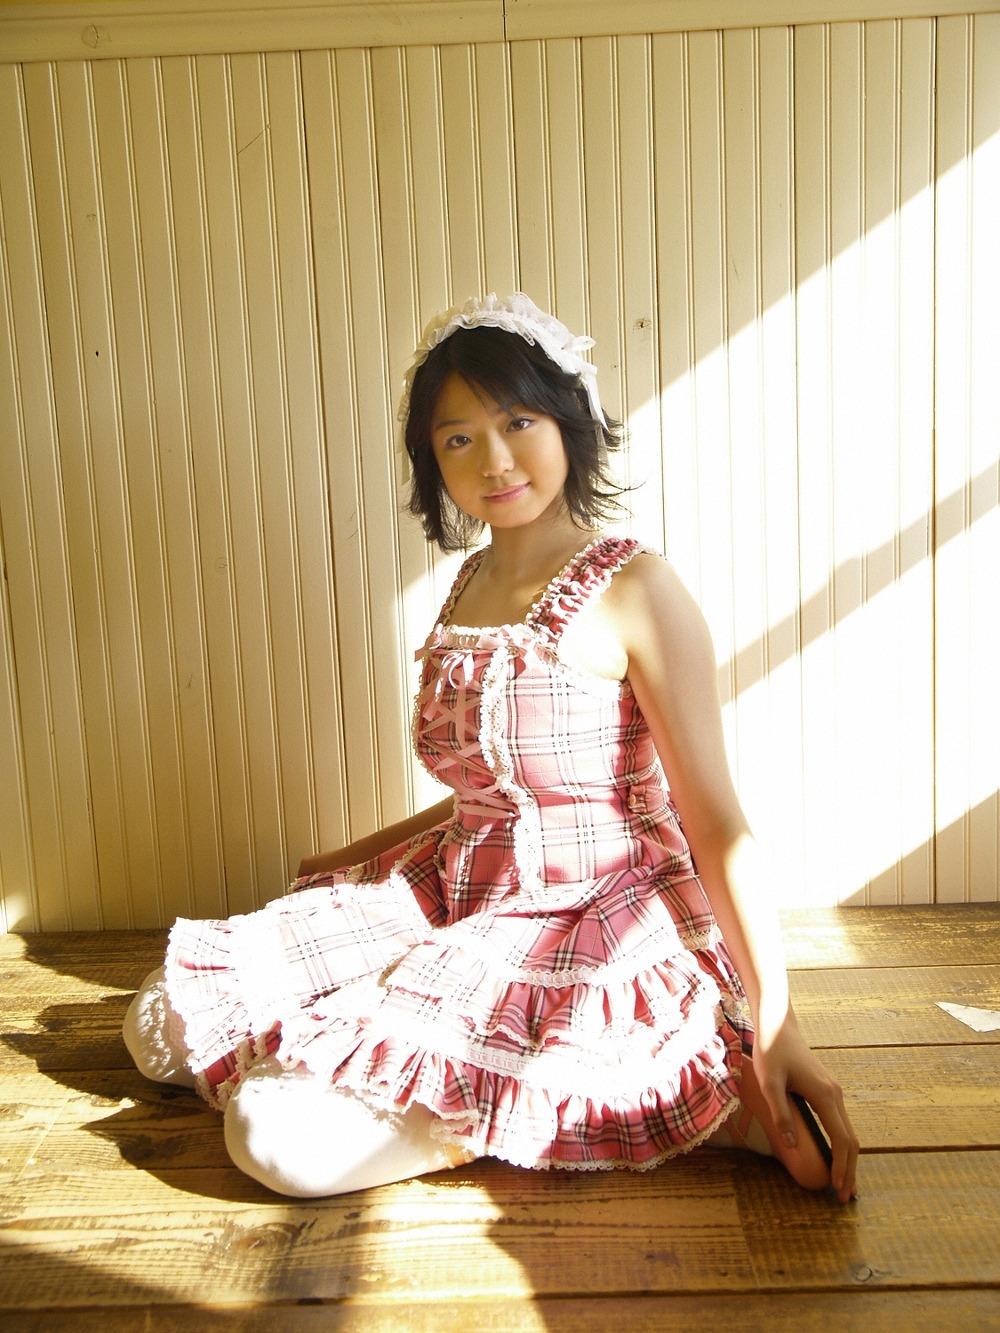 [YS Web] Vol.725 Shizuka Nakamura 中村静香 写真集-美女写真美女图片